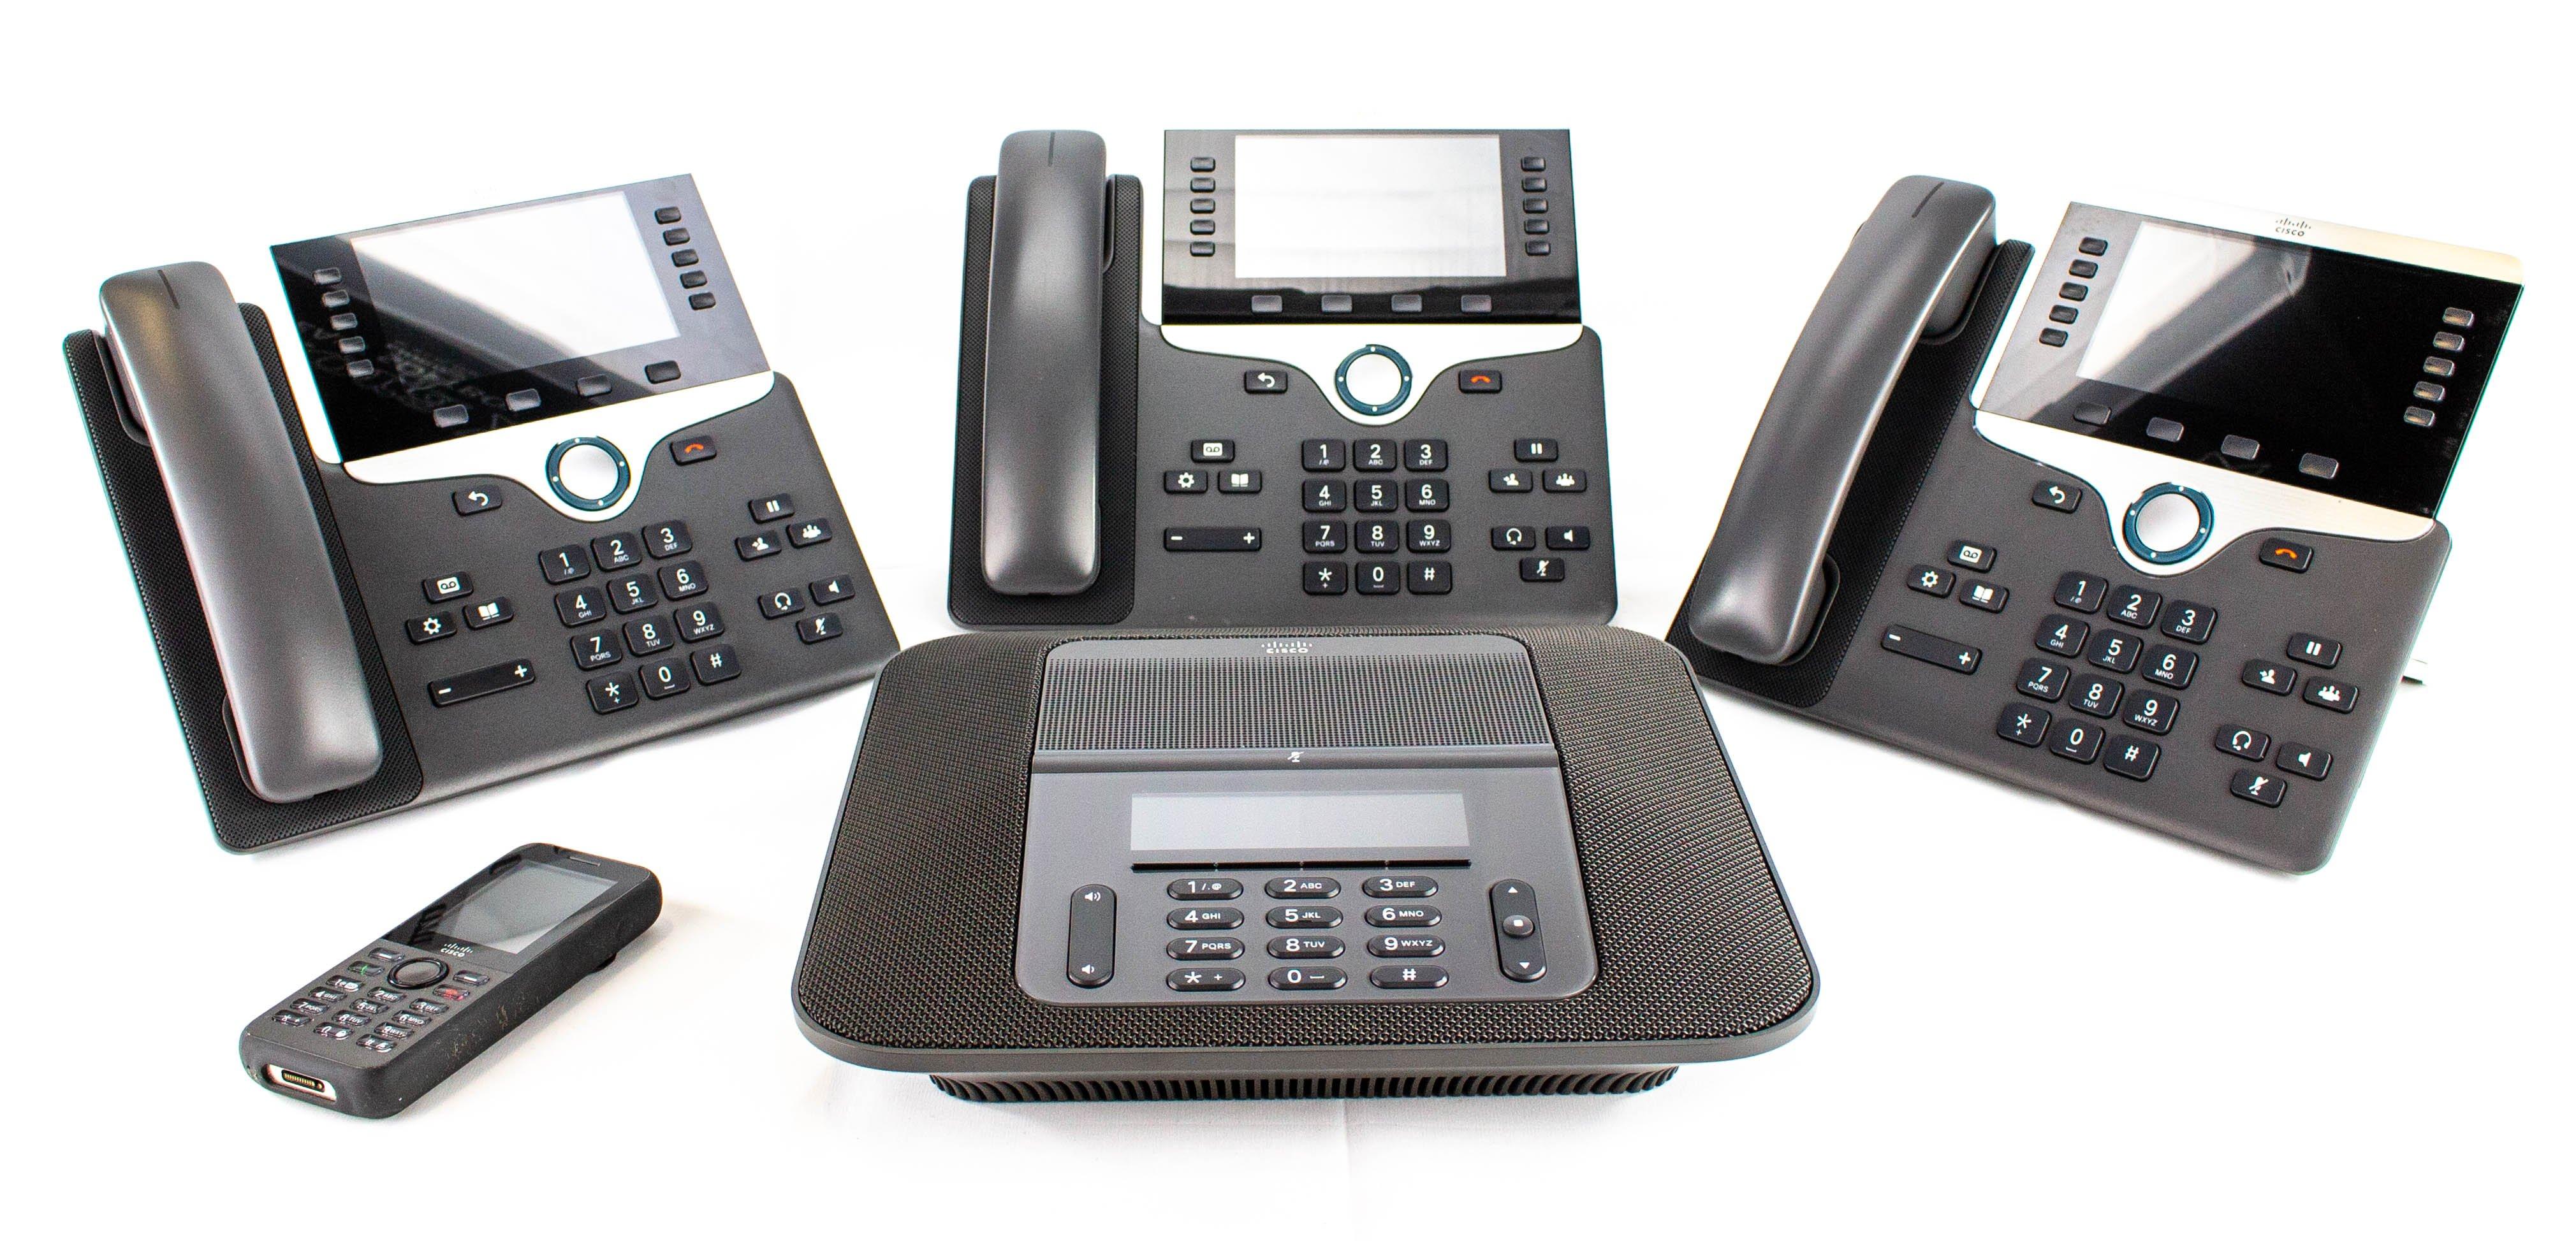 cp-8800-series-phones-PIVIT-GLOBAL-2046